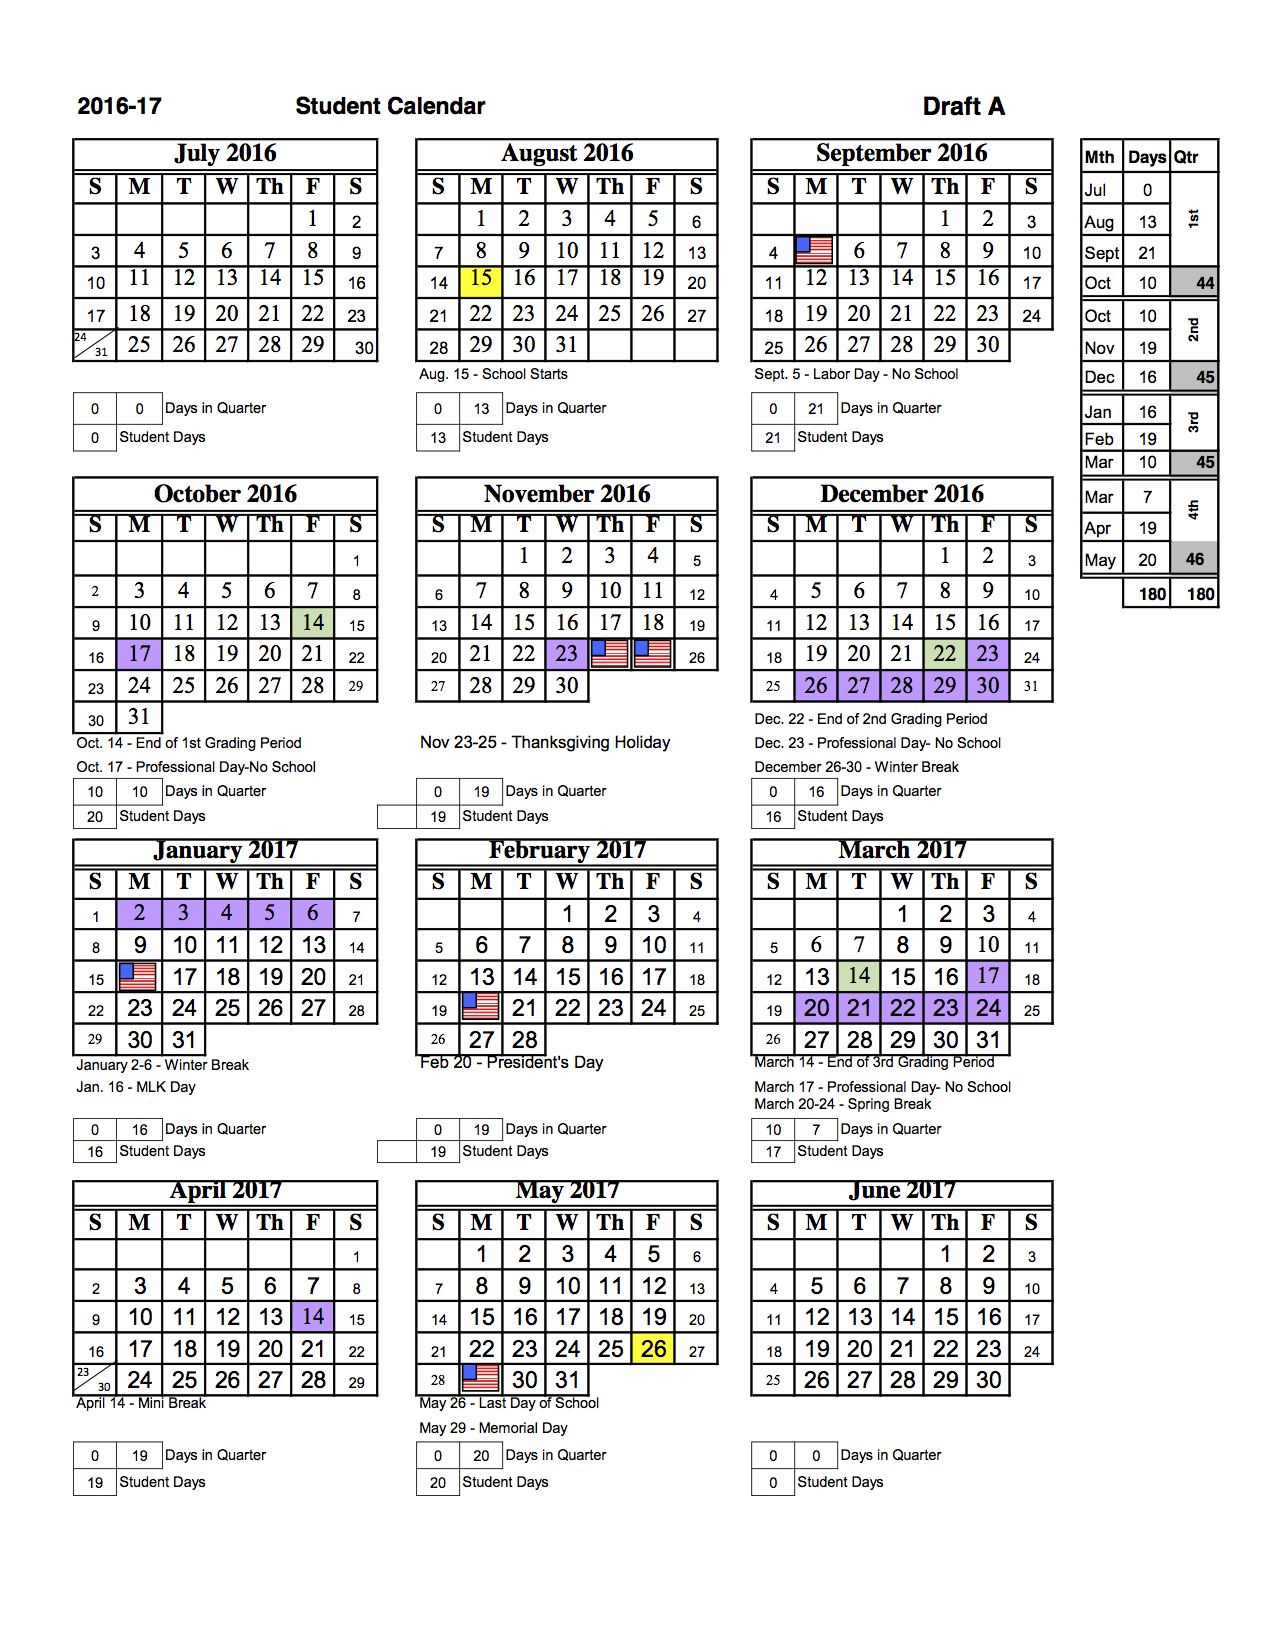 School Calendar 2016 17 : Sarasota county students will return to classes earlier